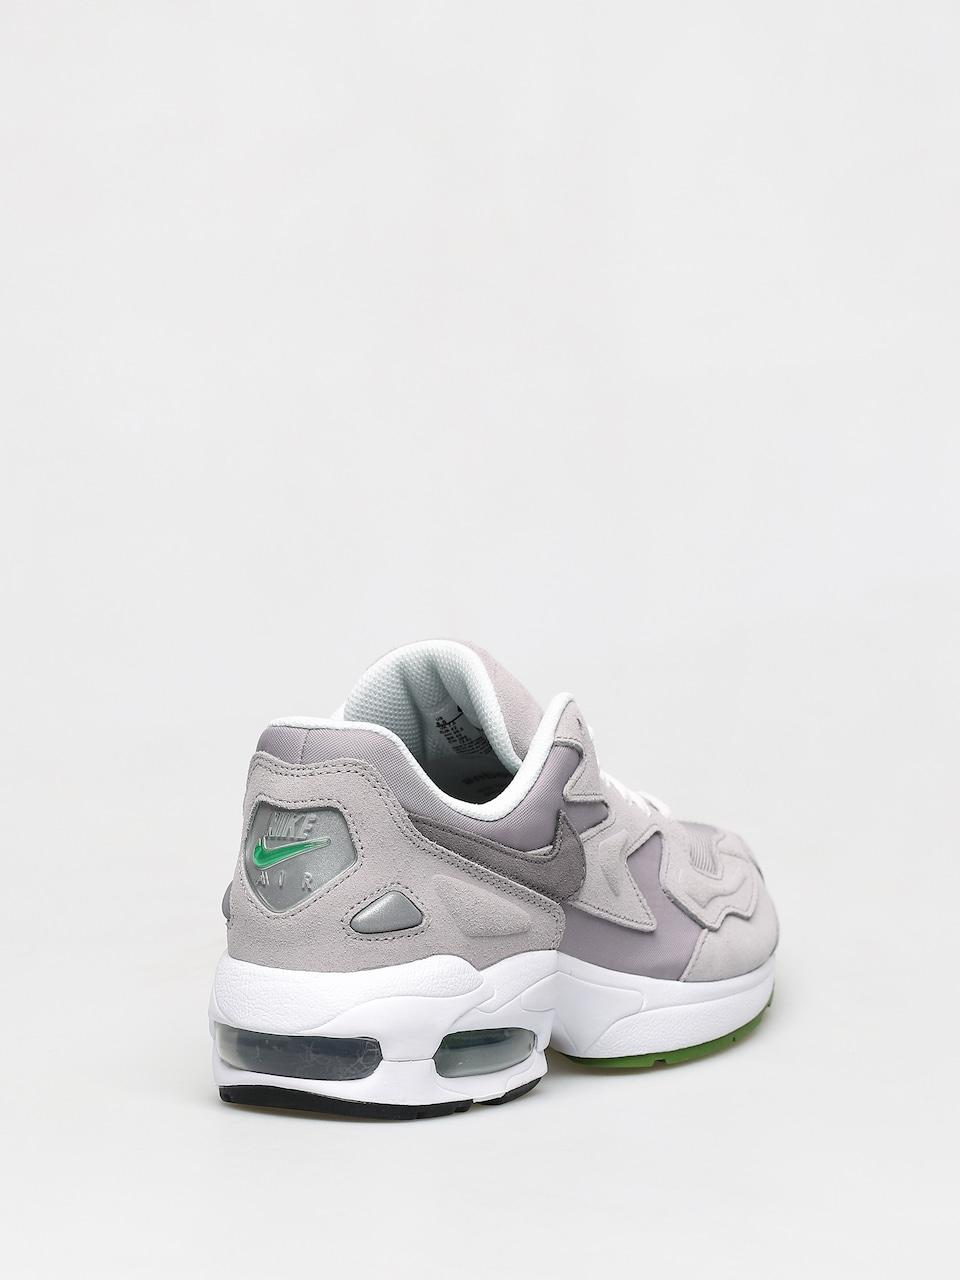 Nike Air Max2 Light Lx